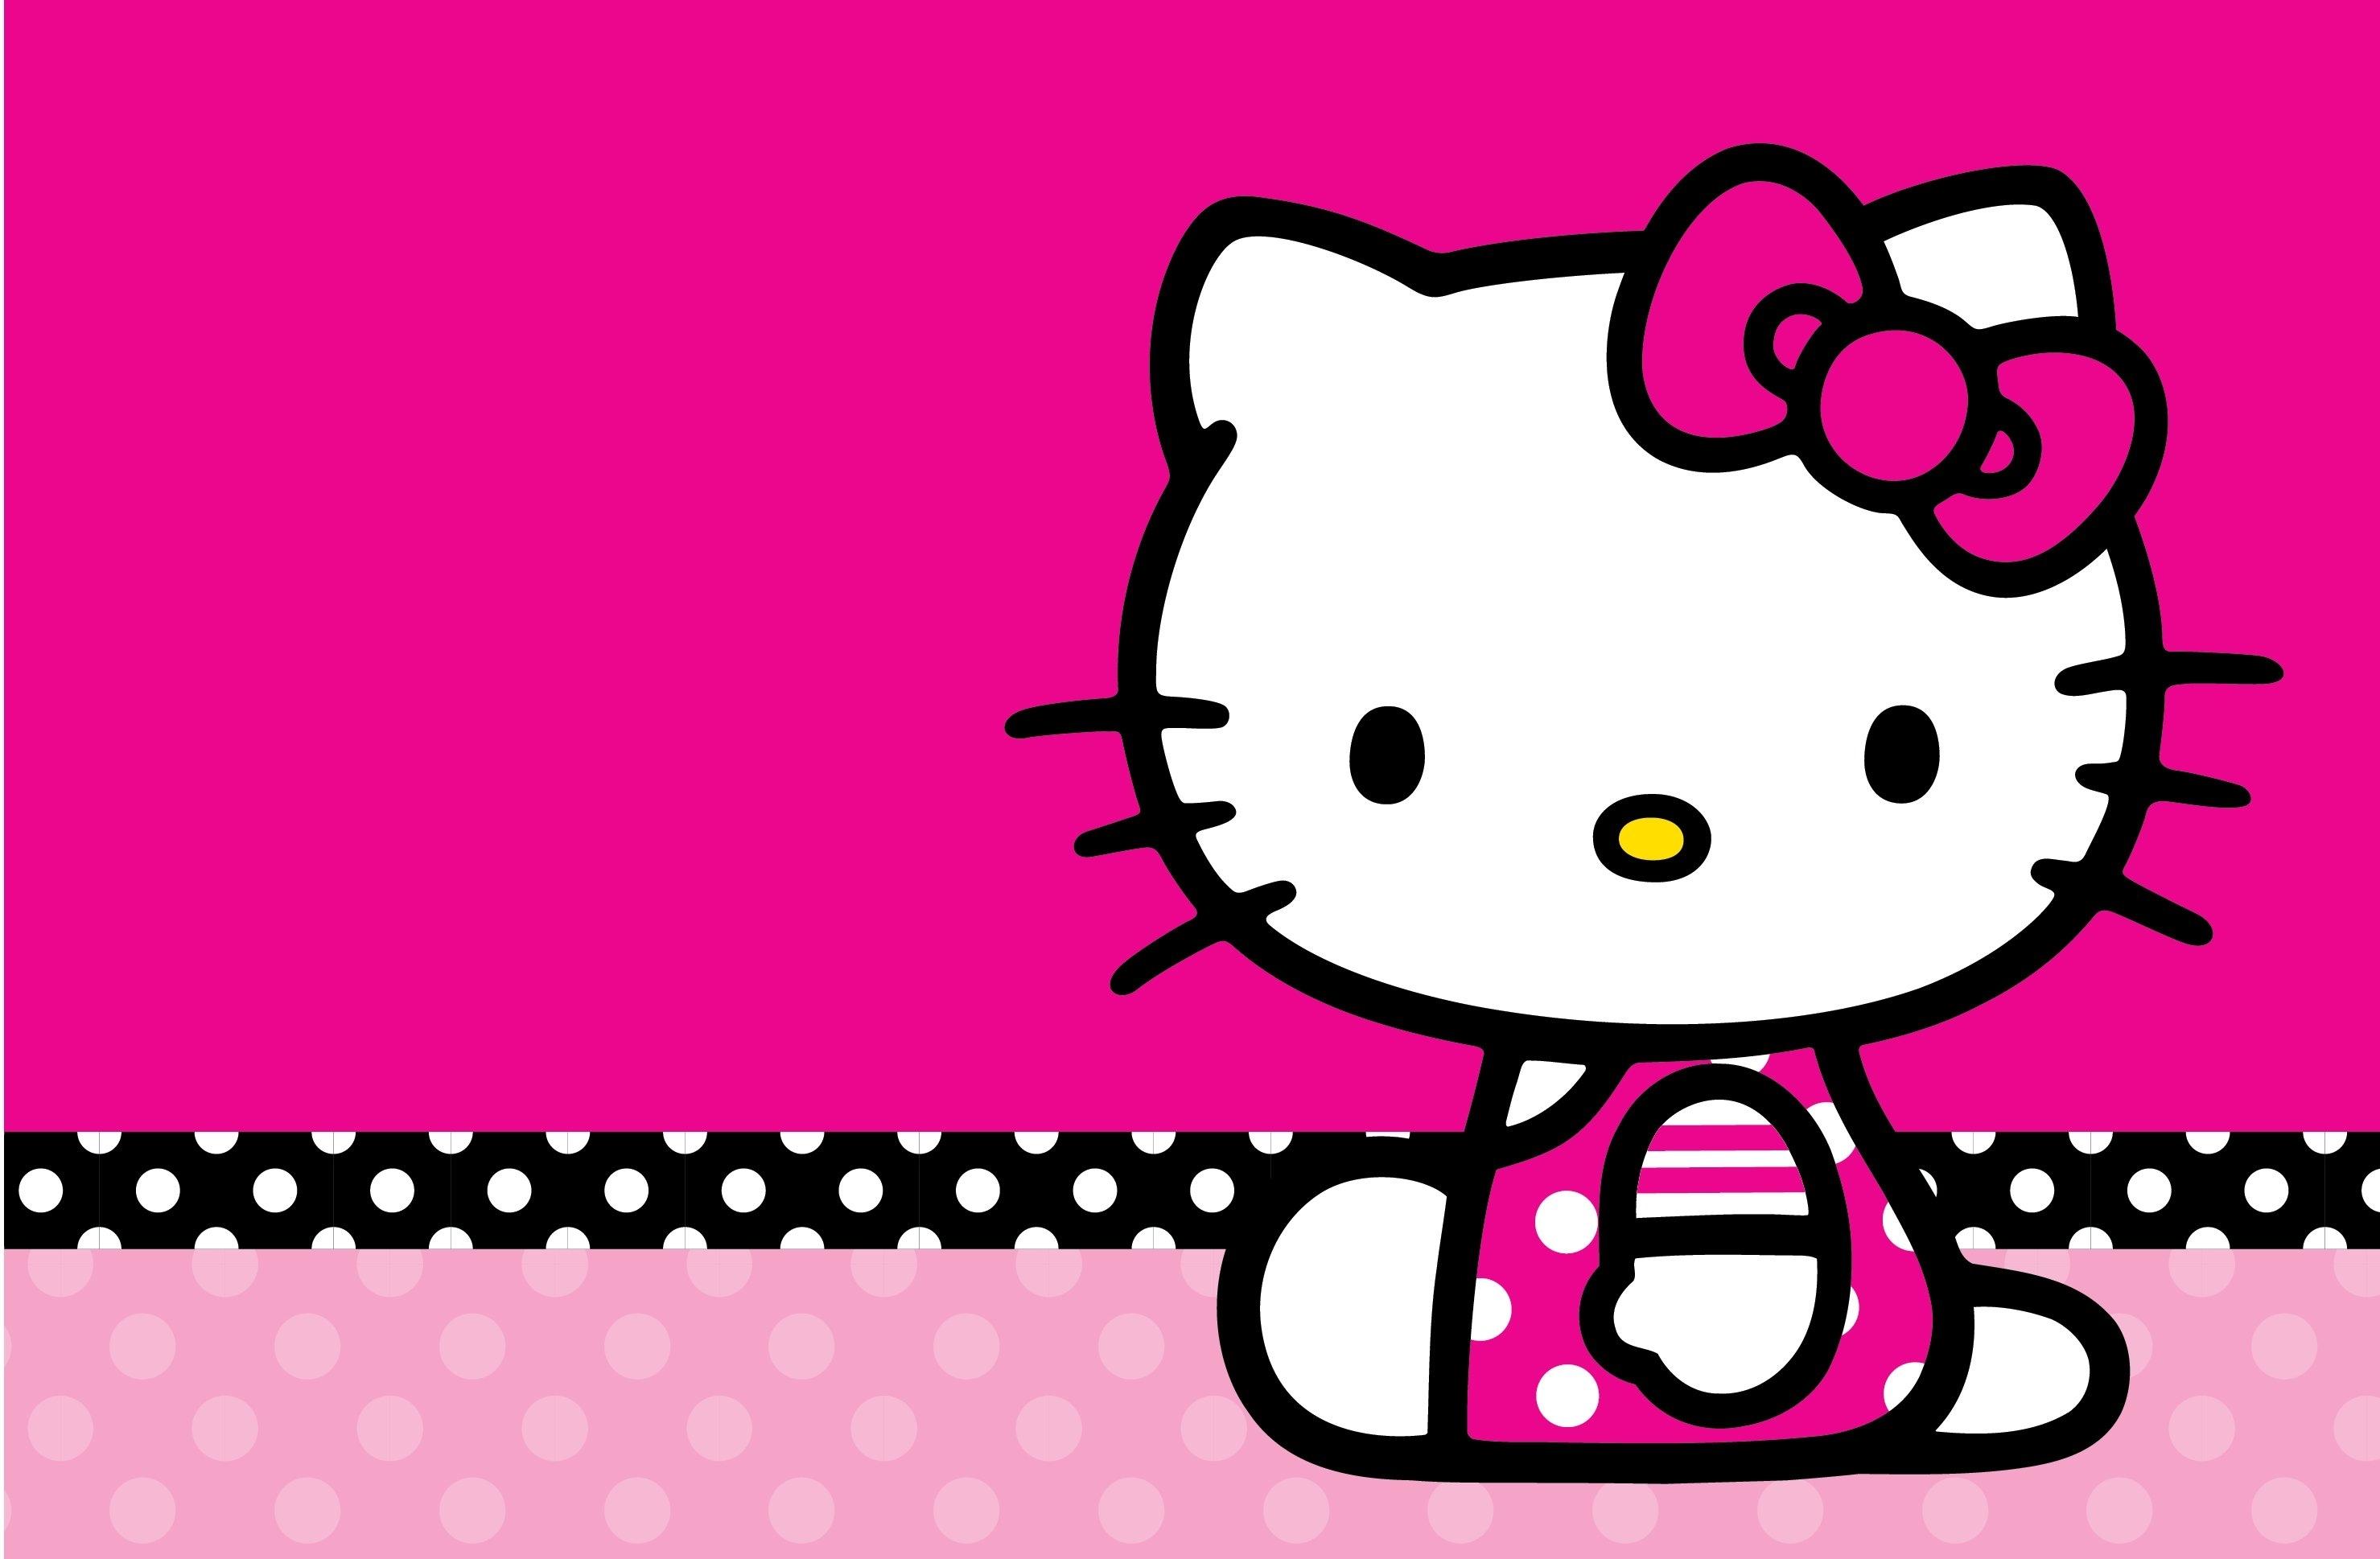 hello kitty fictional character wallpaper - baltana